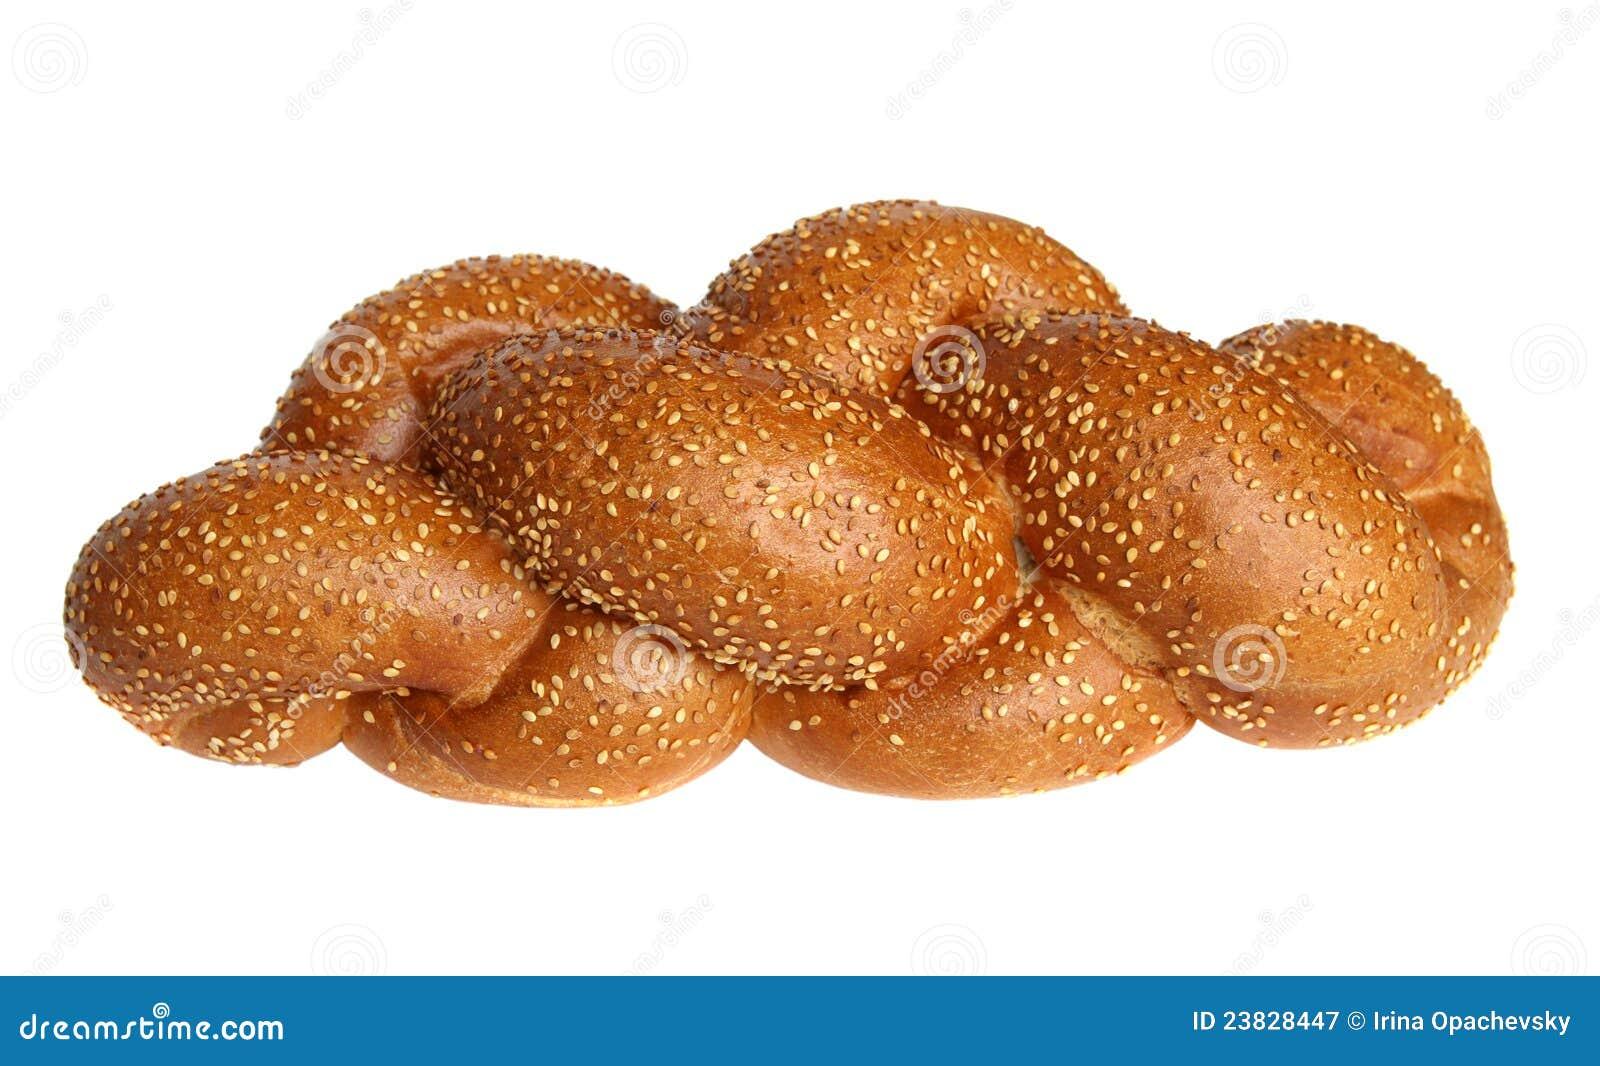 Gevlecht wit brood